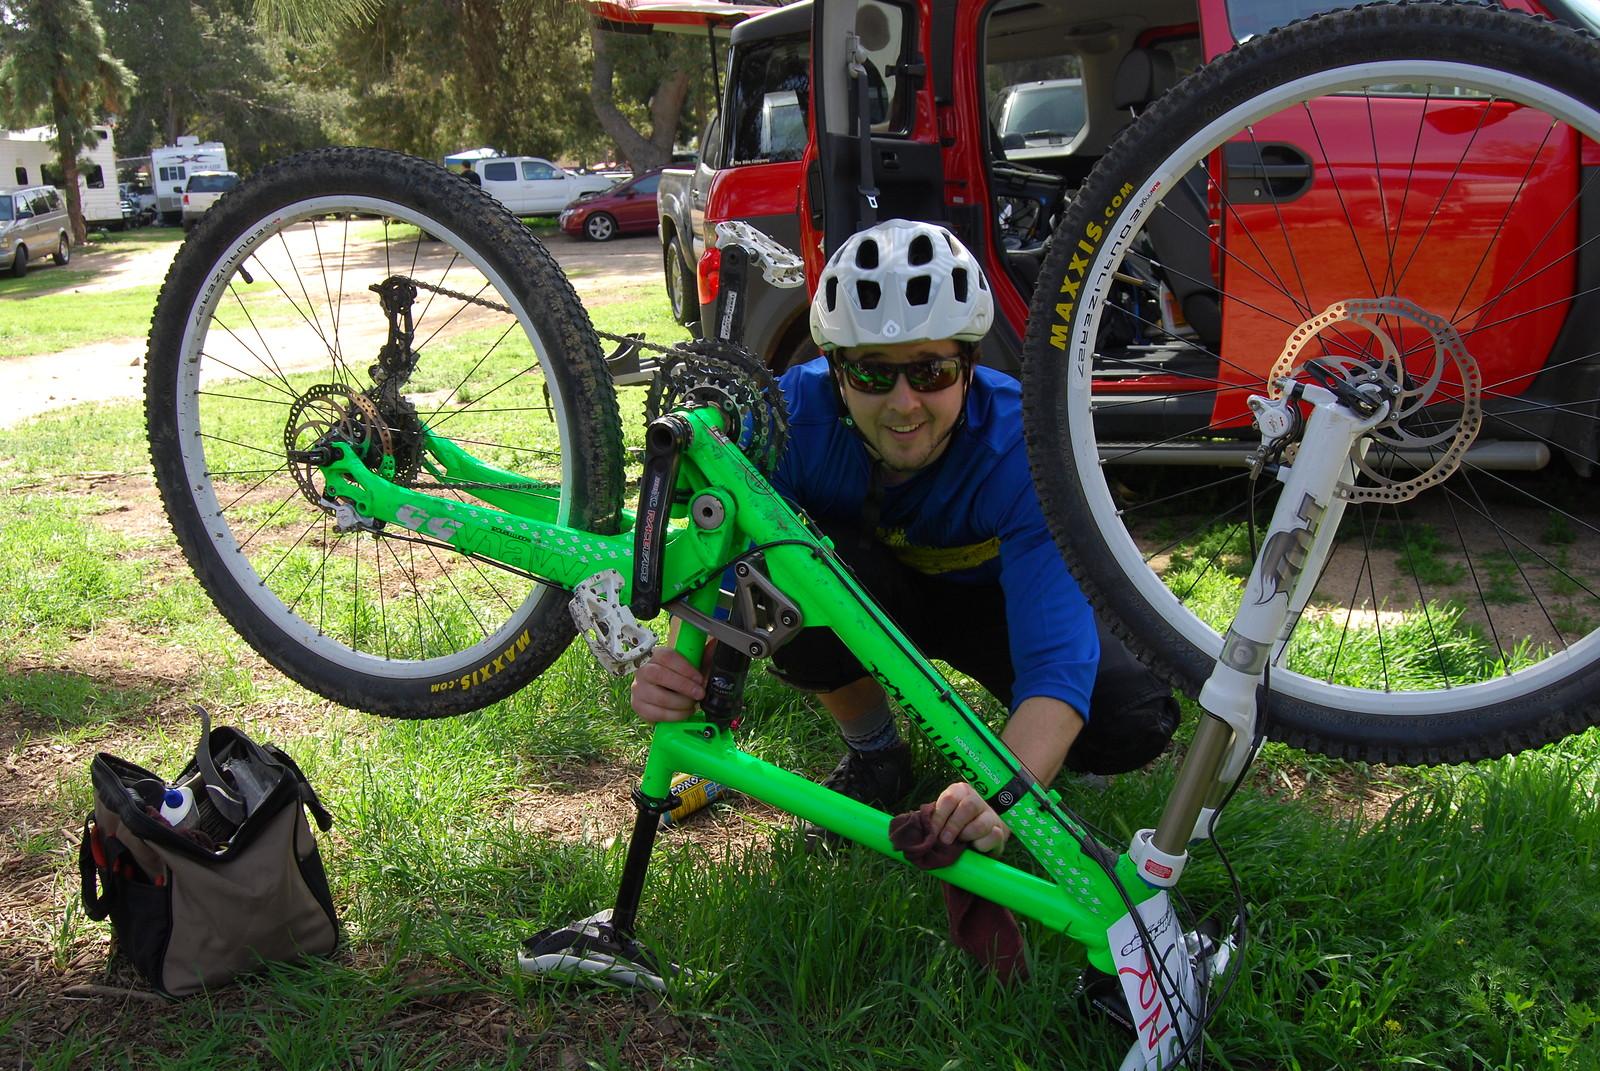 DSC 0027 - alpaca04 - Mountain Biking Pictures - Vital MTB